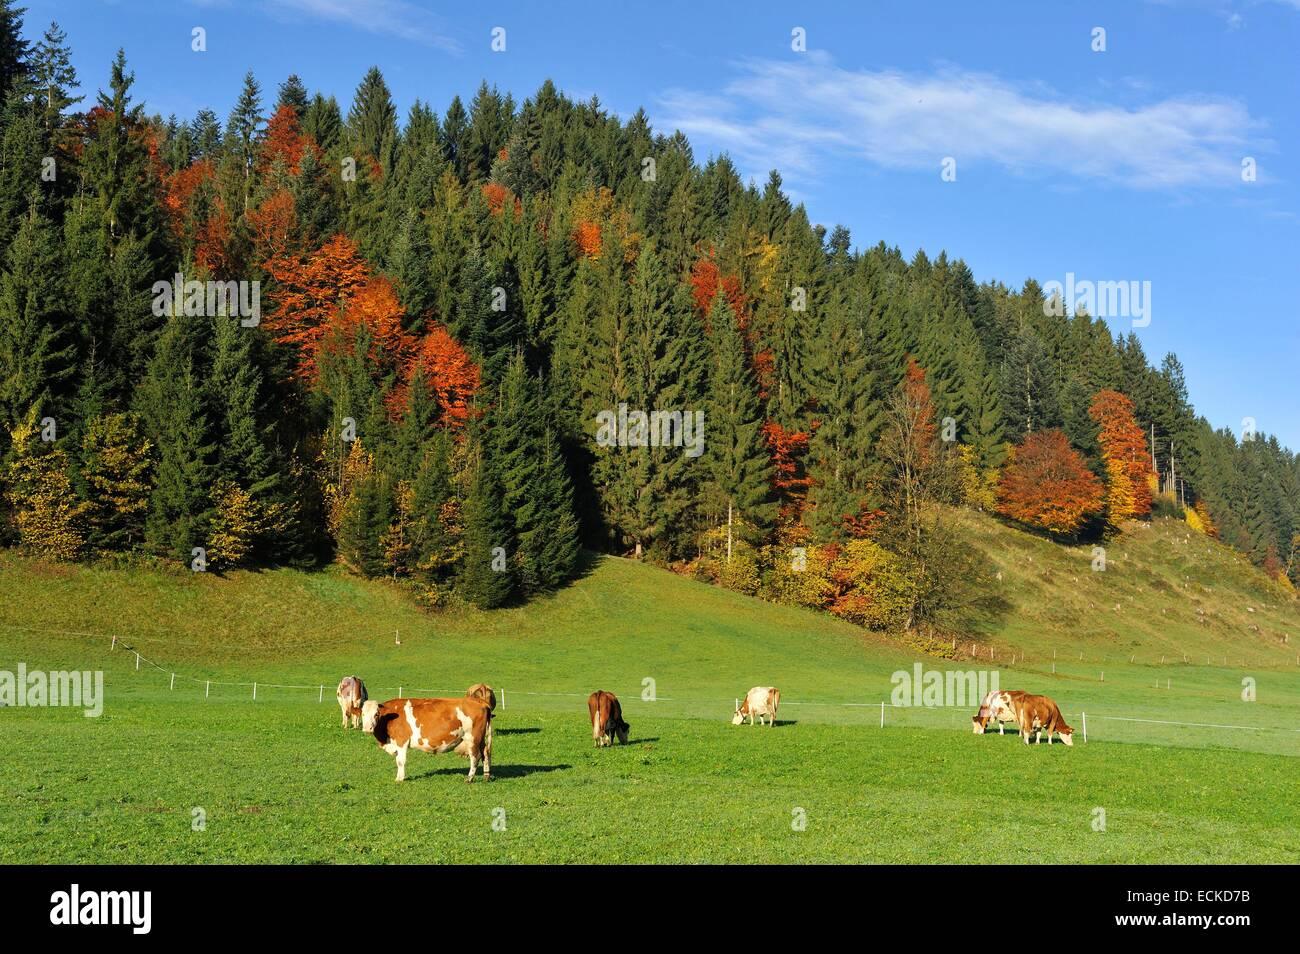 Austria, Tyrol, Oberndorf im Tyrol, Alpine scenery - Stock Image